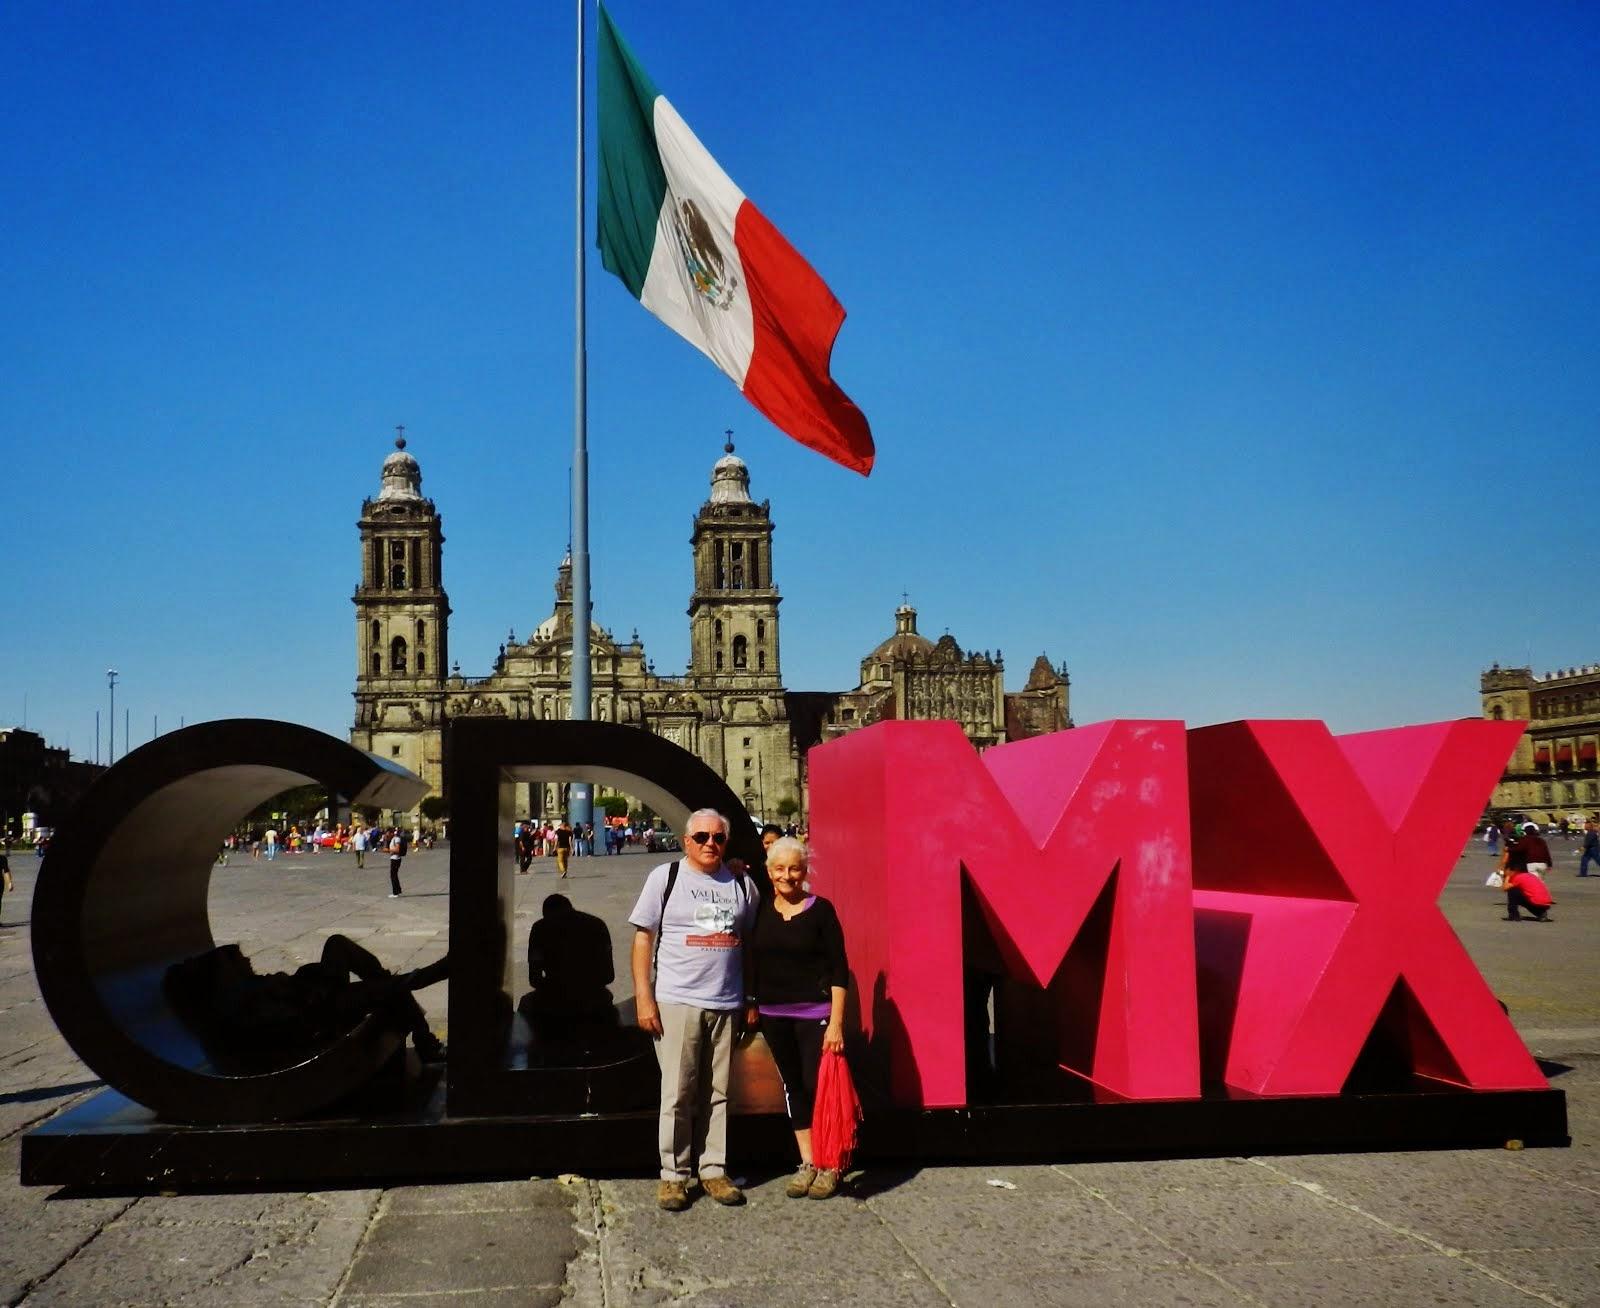 México Verano 2015 (invierno allá)